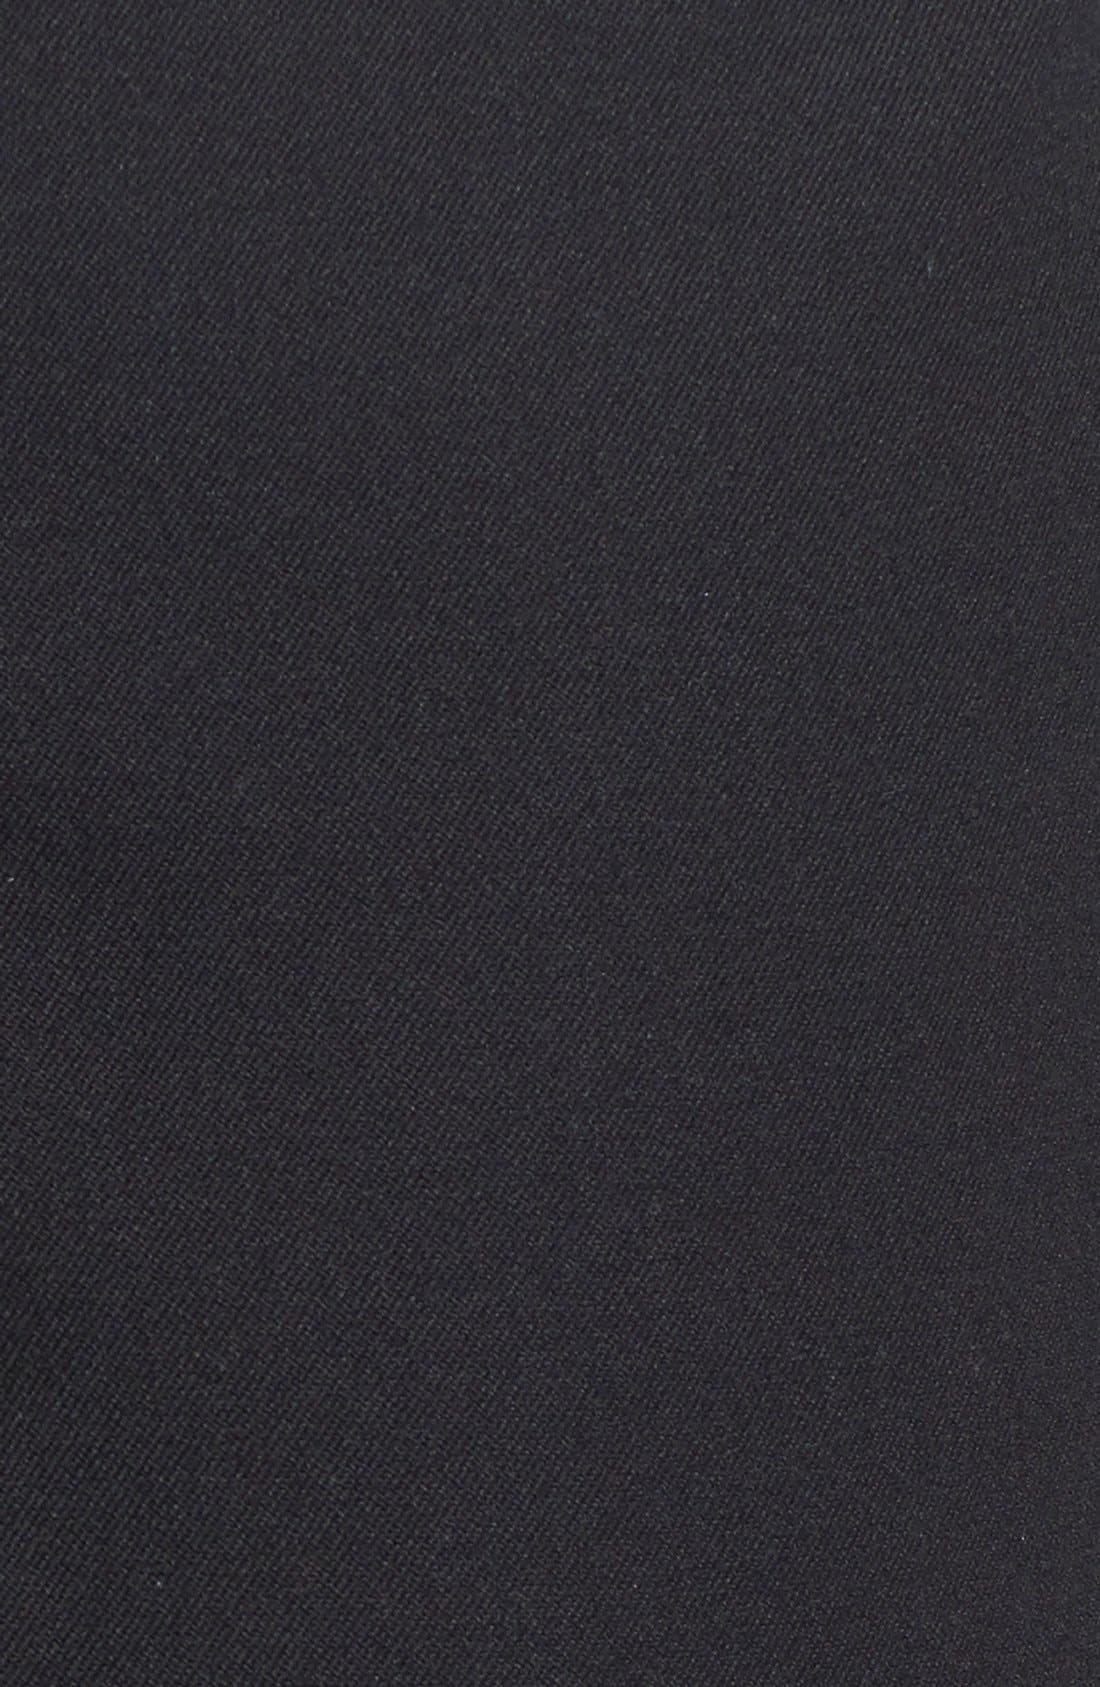 MING WANG,                             Woven Slim Ankle Pants,                             Alternate thumbnail 10, color,                             BLACK